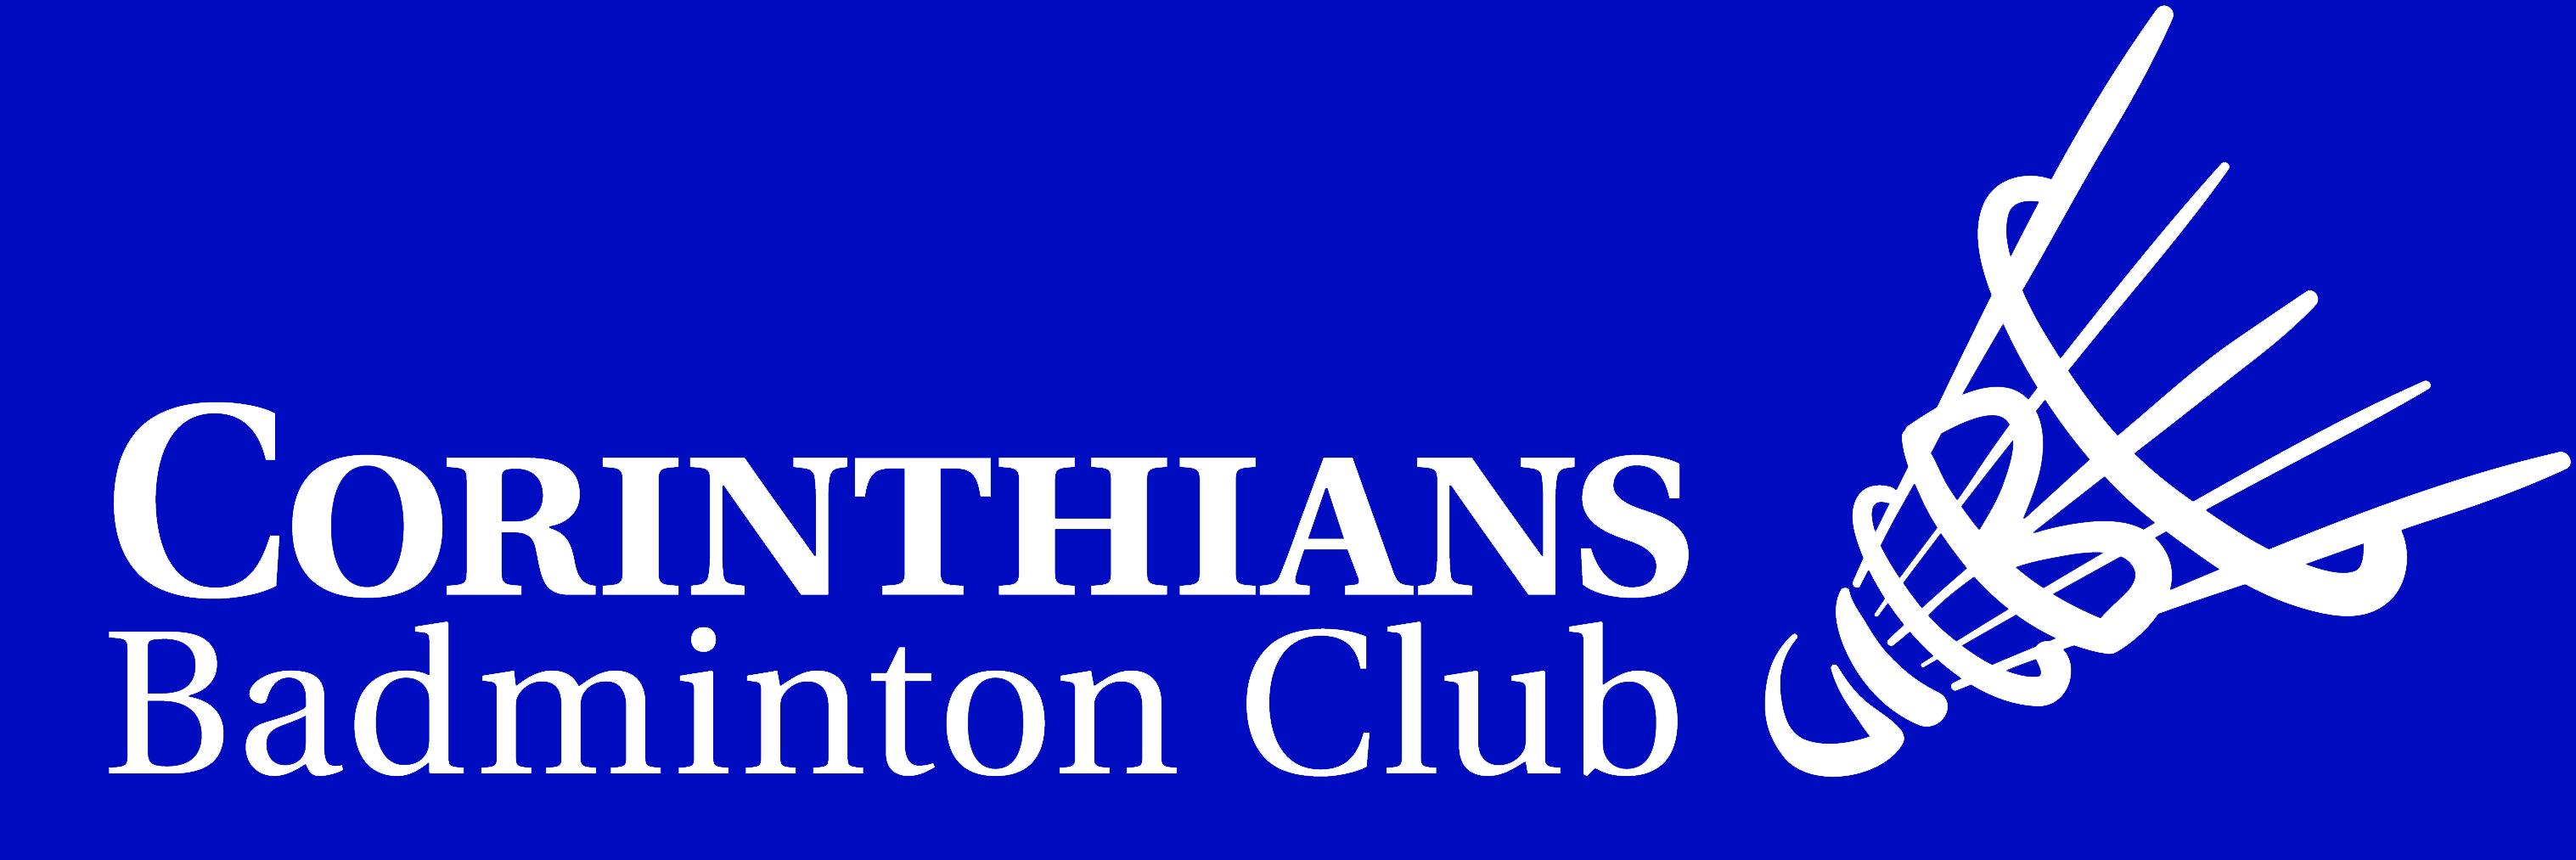 Corinthians Badminton Club